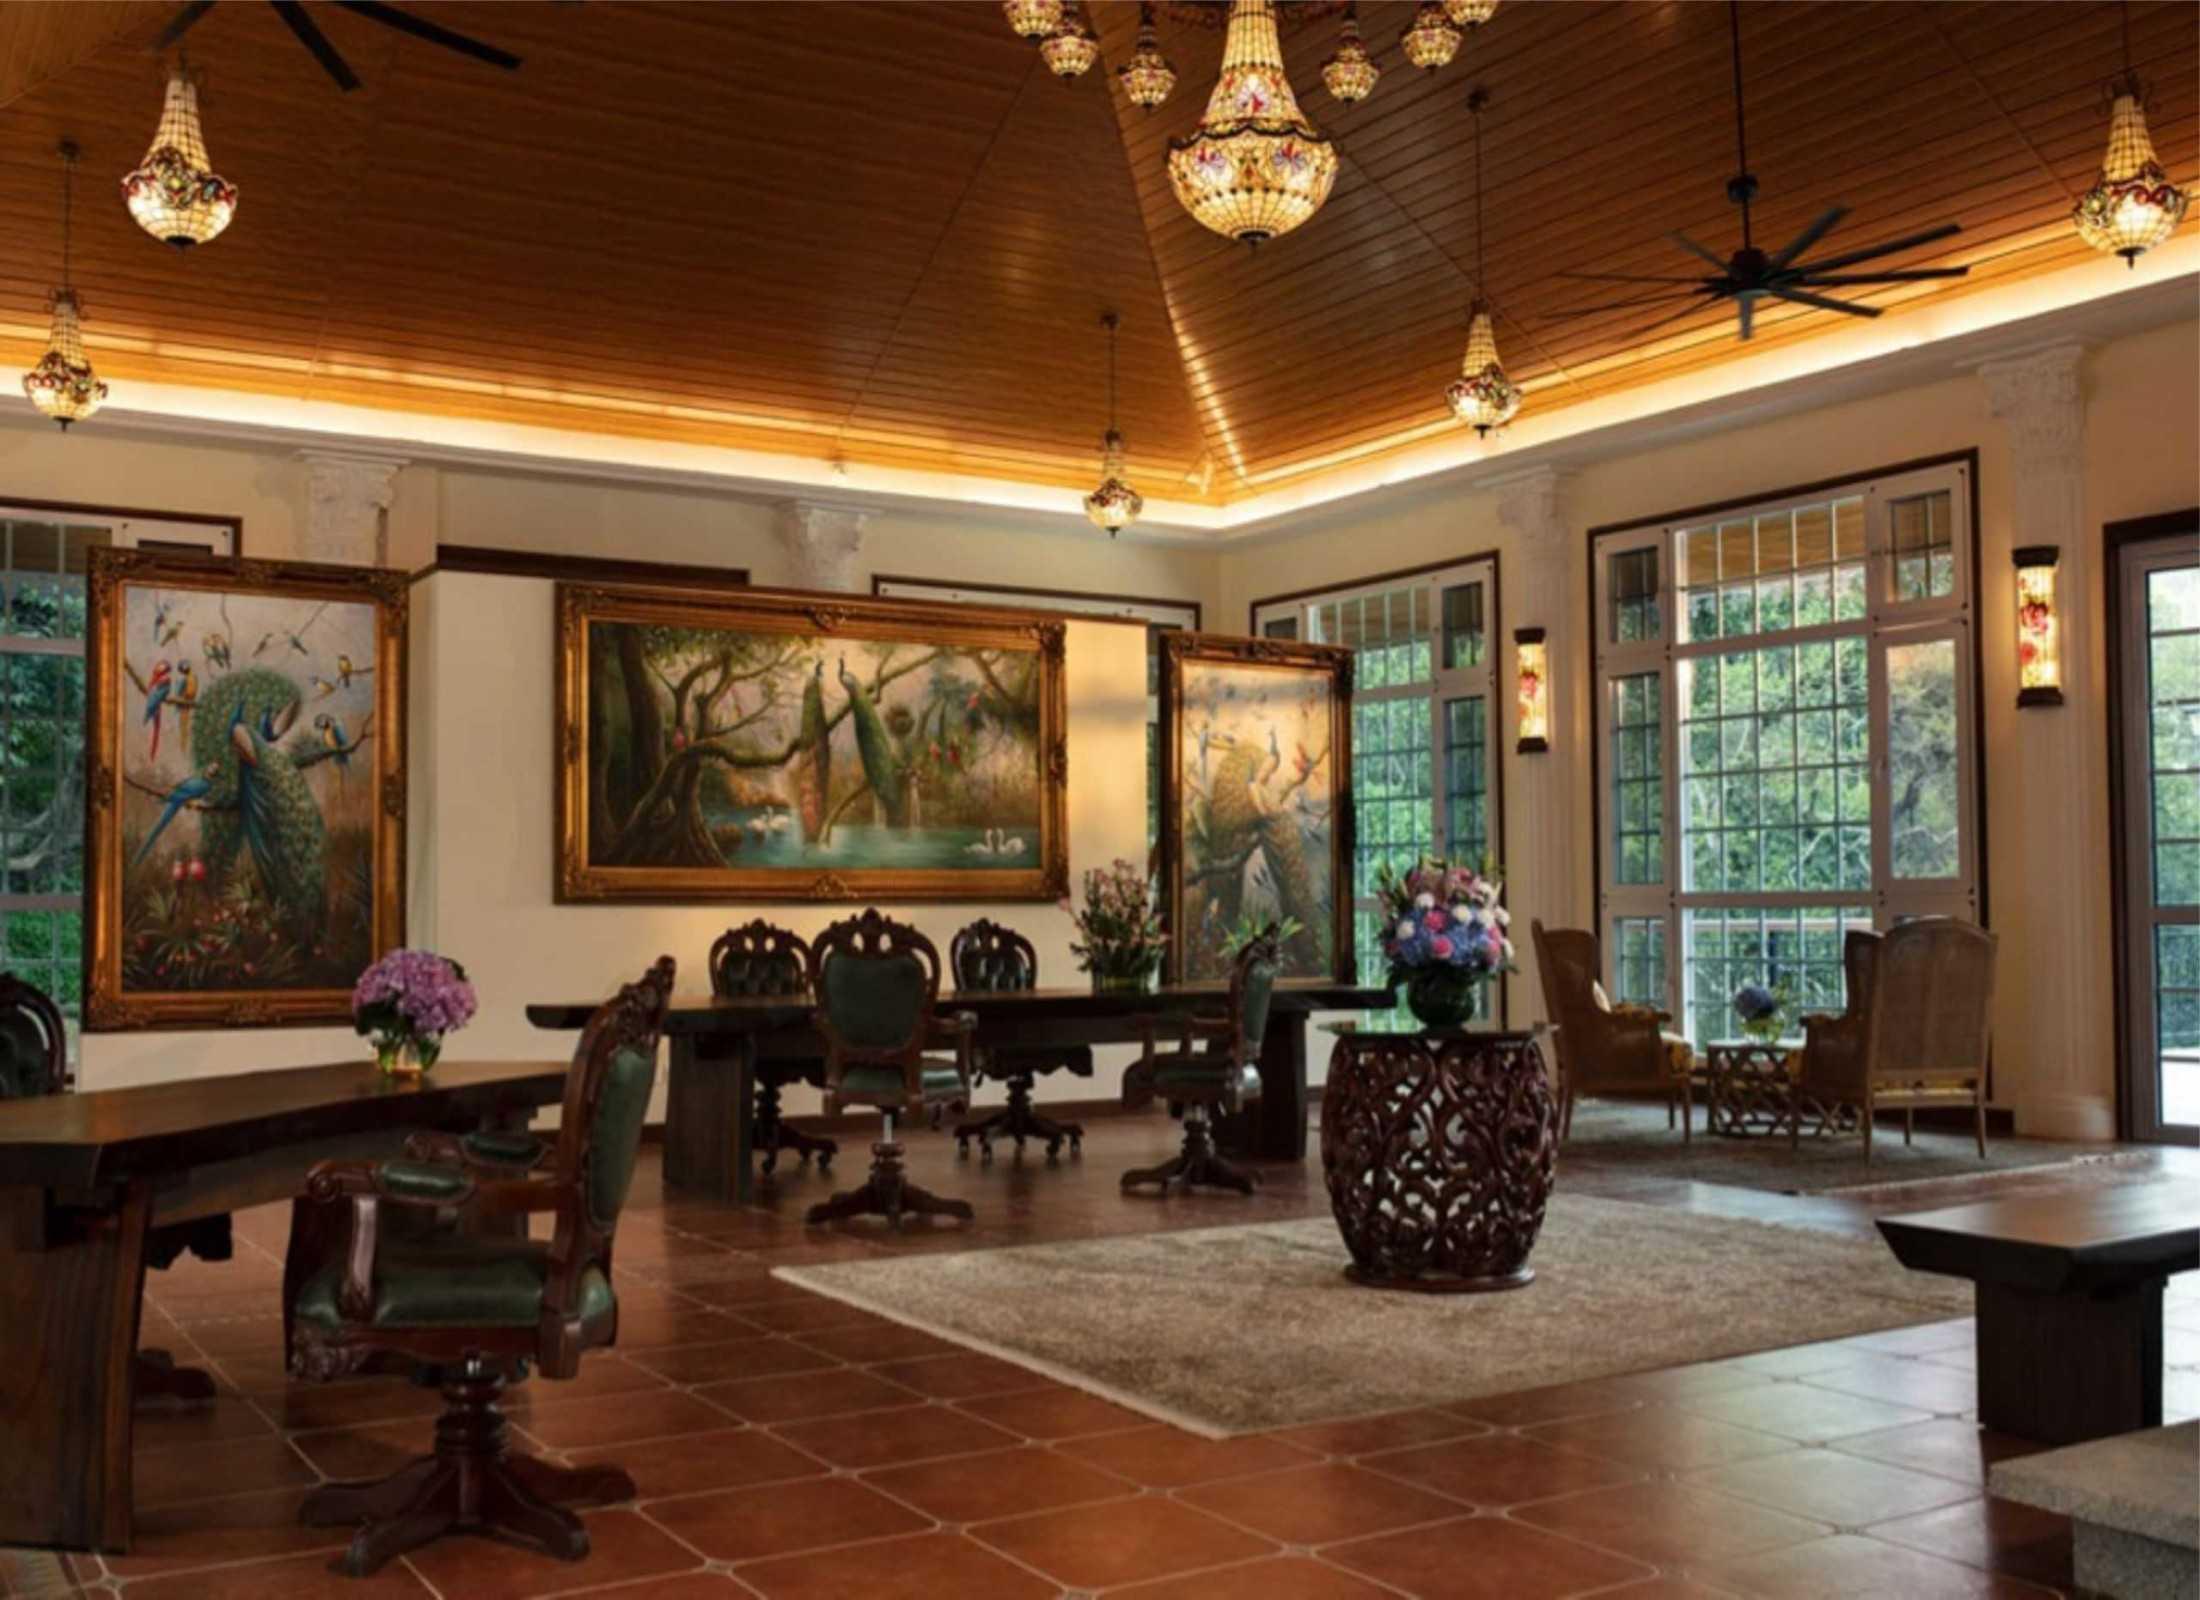 Rekai Design Interior Coorg Wilderness Resort, Coorg-India Virajpet, Main, Mysore - Madikeri Rd, Madikeri, Karnataka 571201, India Virajpet, Main, Mysore - Madikeri Rd, Madikeri, Karnataka 571201, India Rekai-Design-Interior-Coorg-Wilderness-Resort-Coorg-India  113301